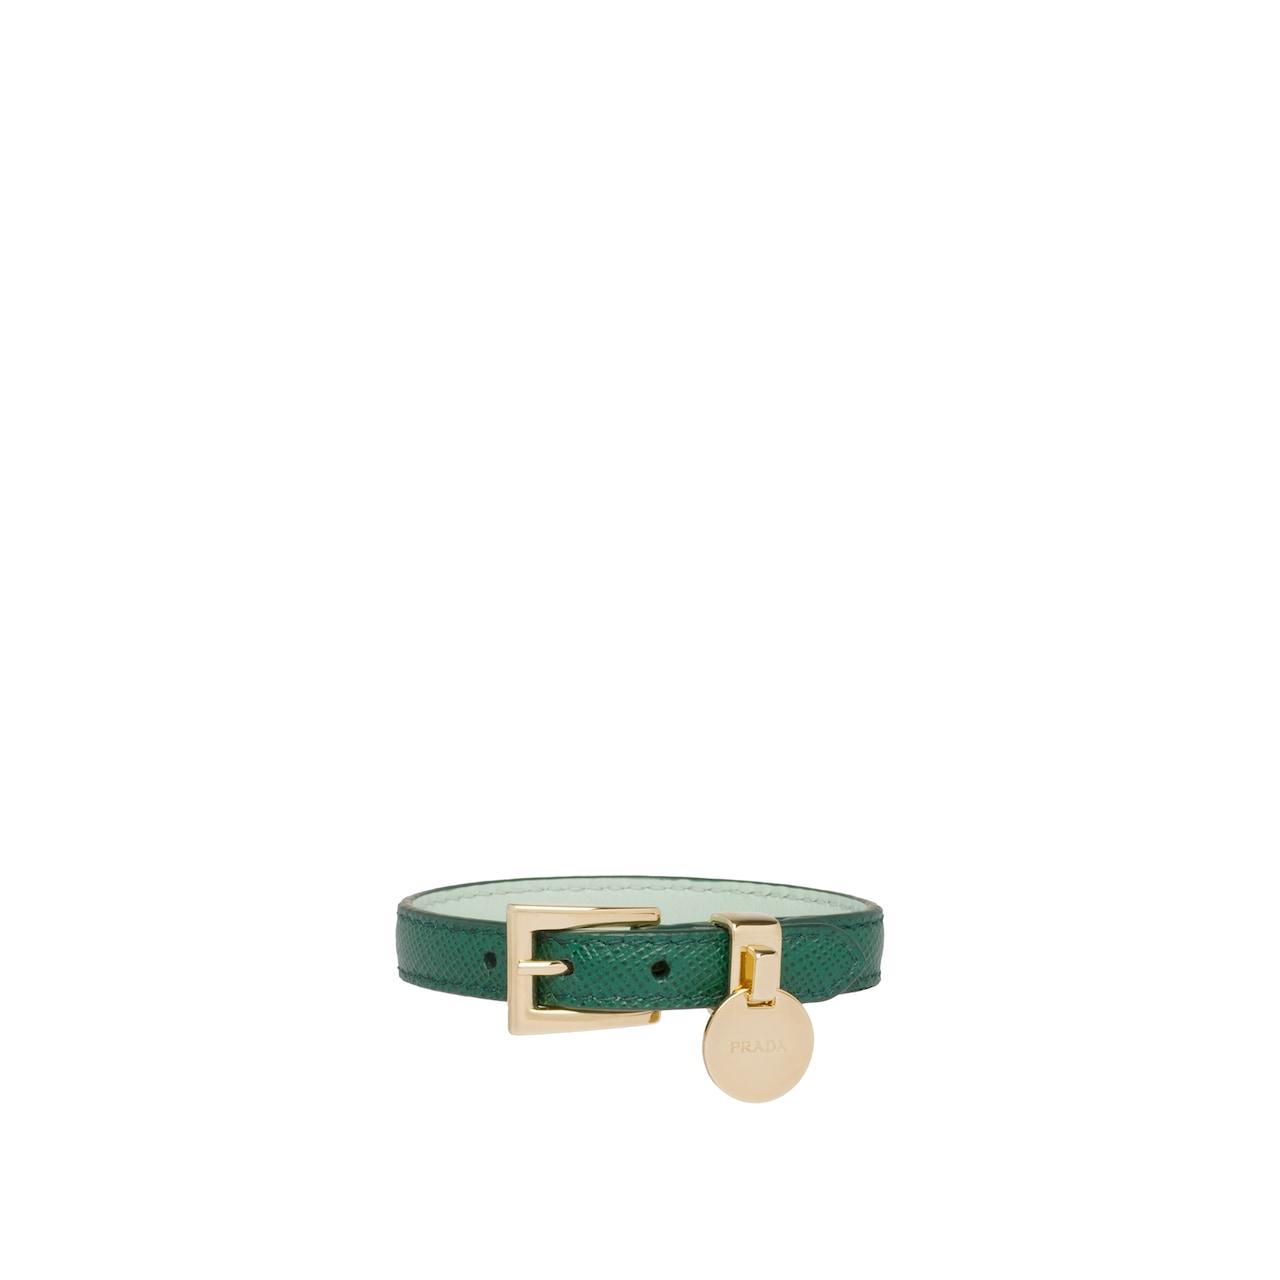 a5c52b6ee2a34 Zweifarbiges Armband aus Saffiano Leder